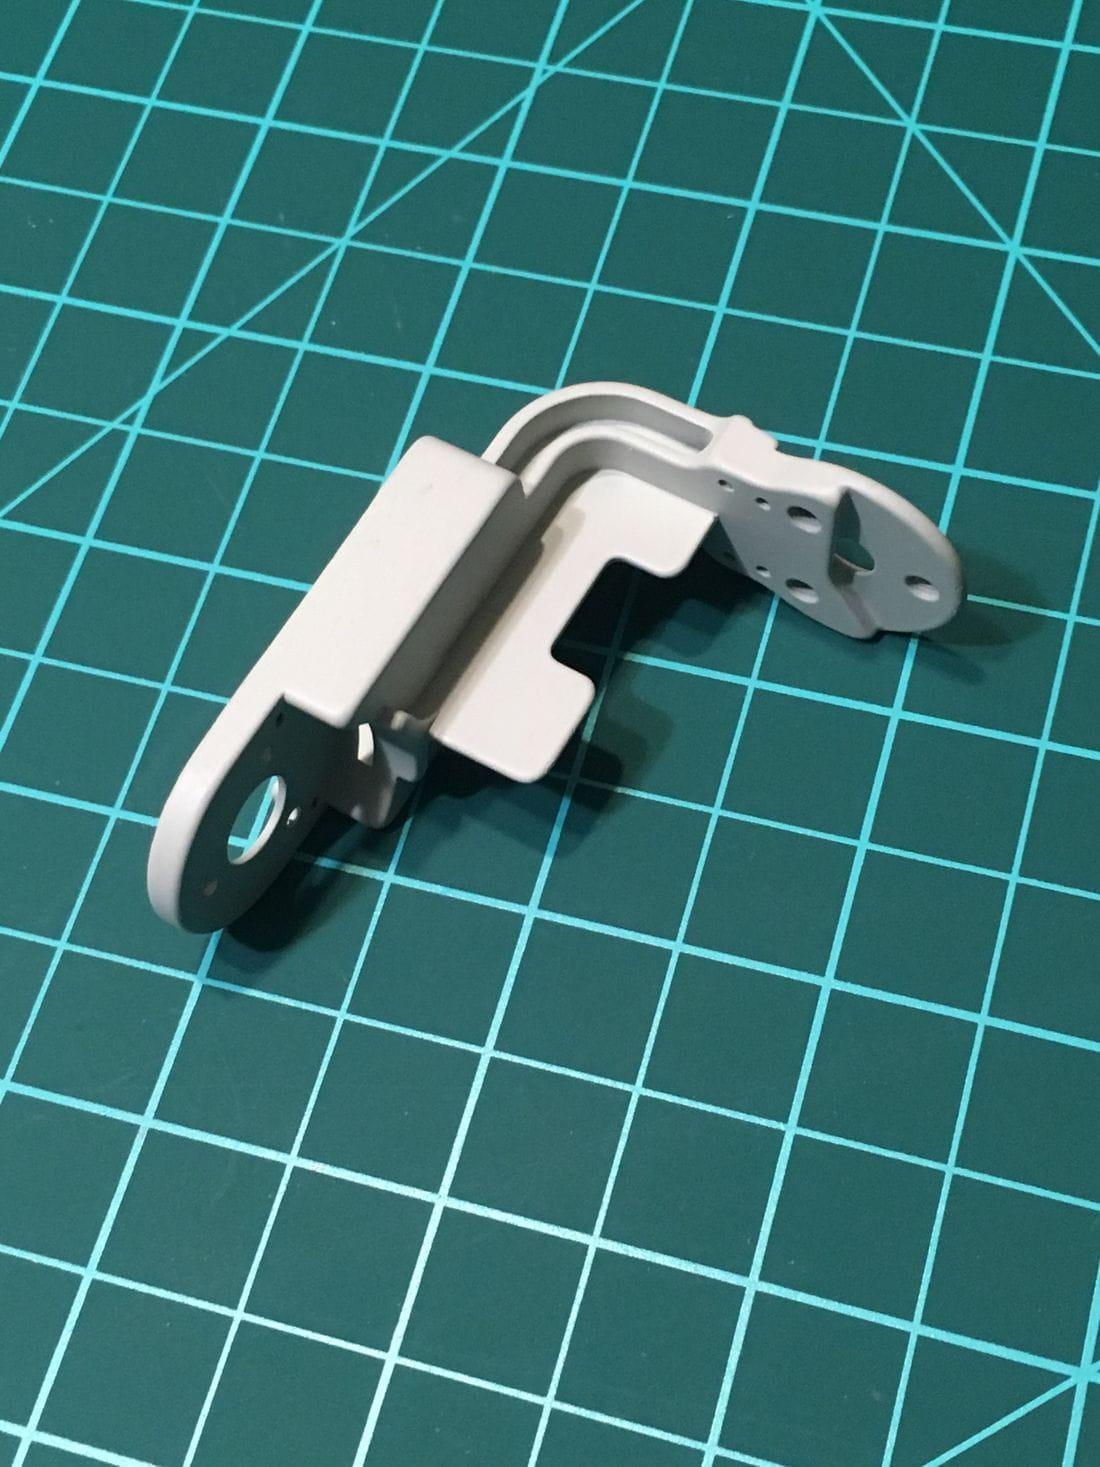 Piezas de reparación de brazo de gimbal Yaw para DJI Phantom 4 Pro / Pro +